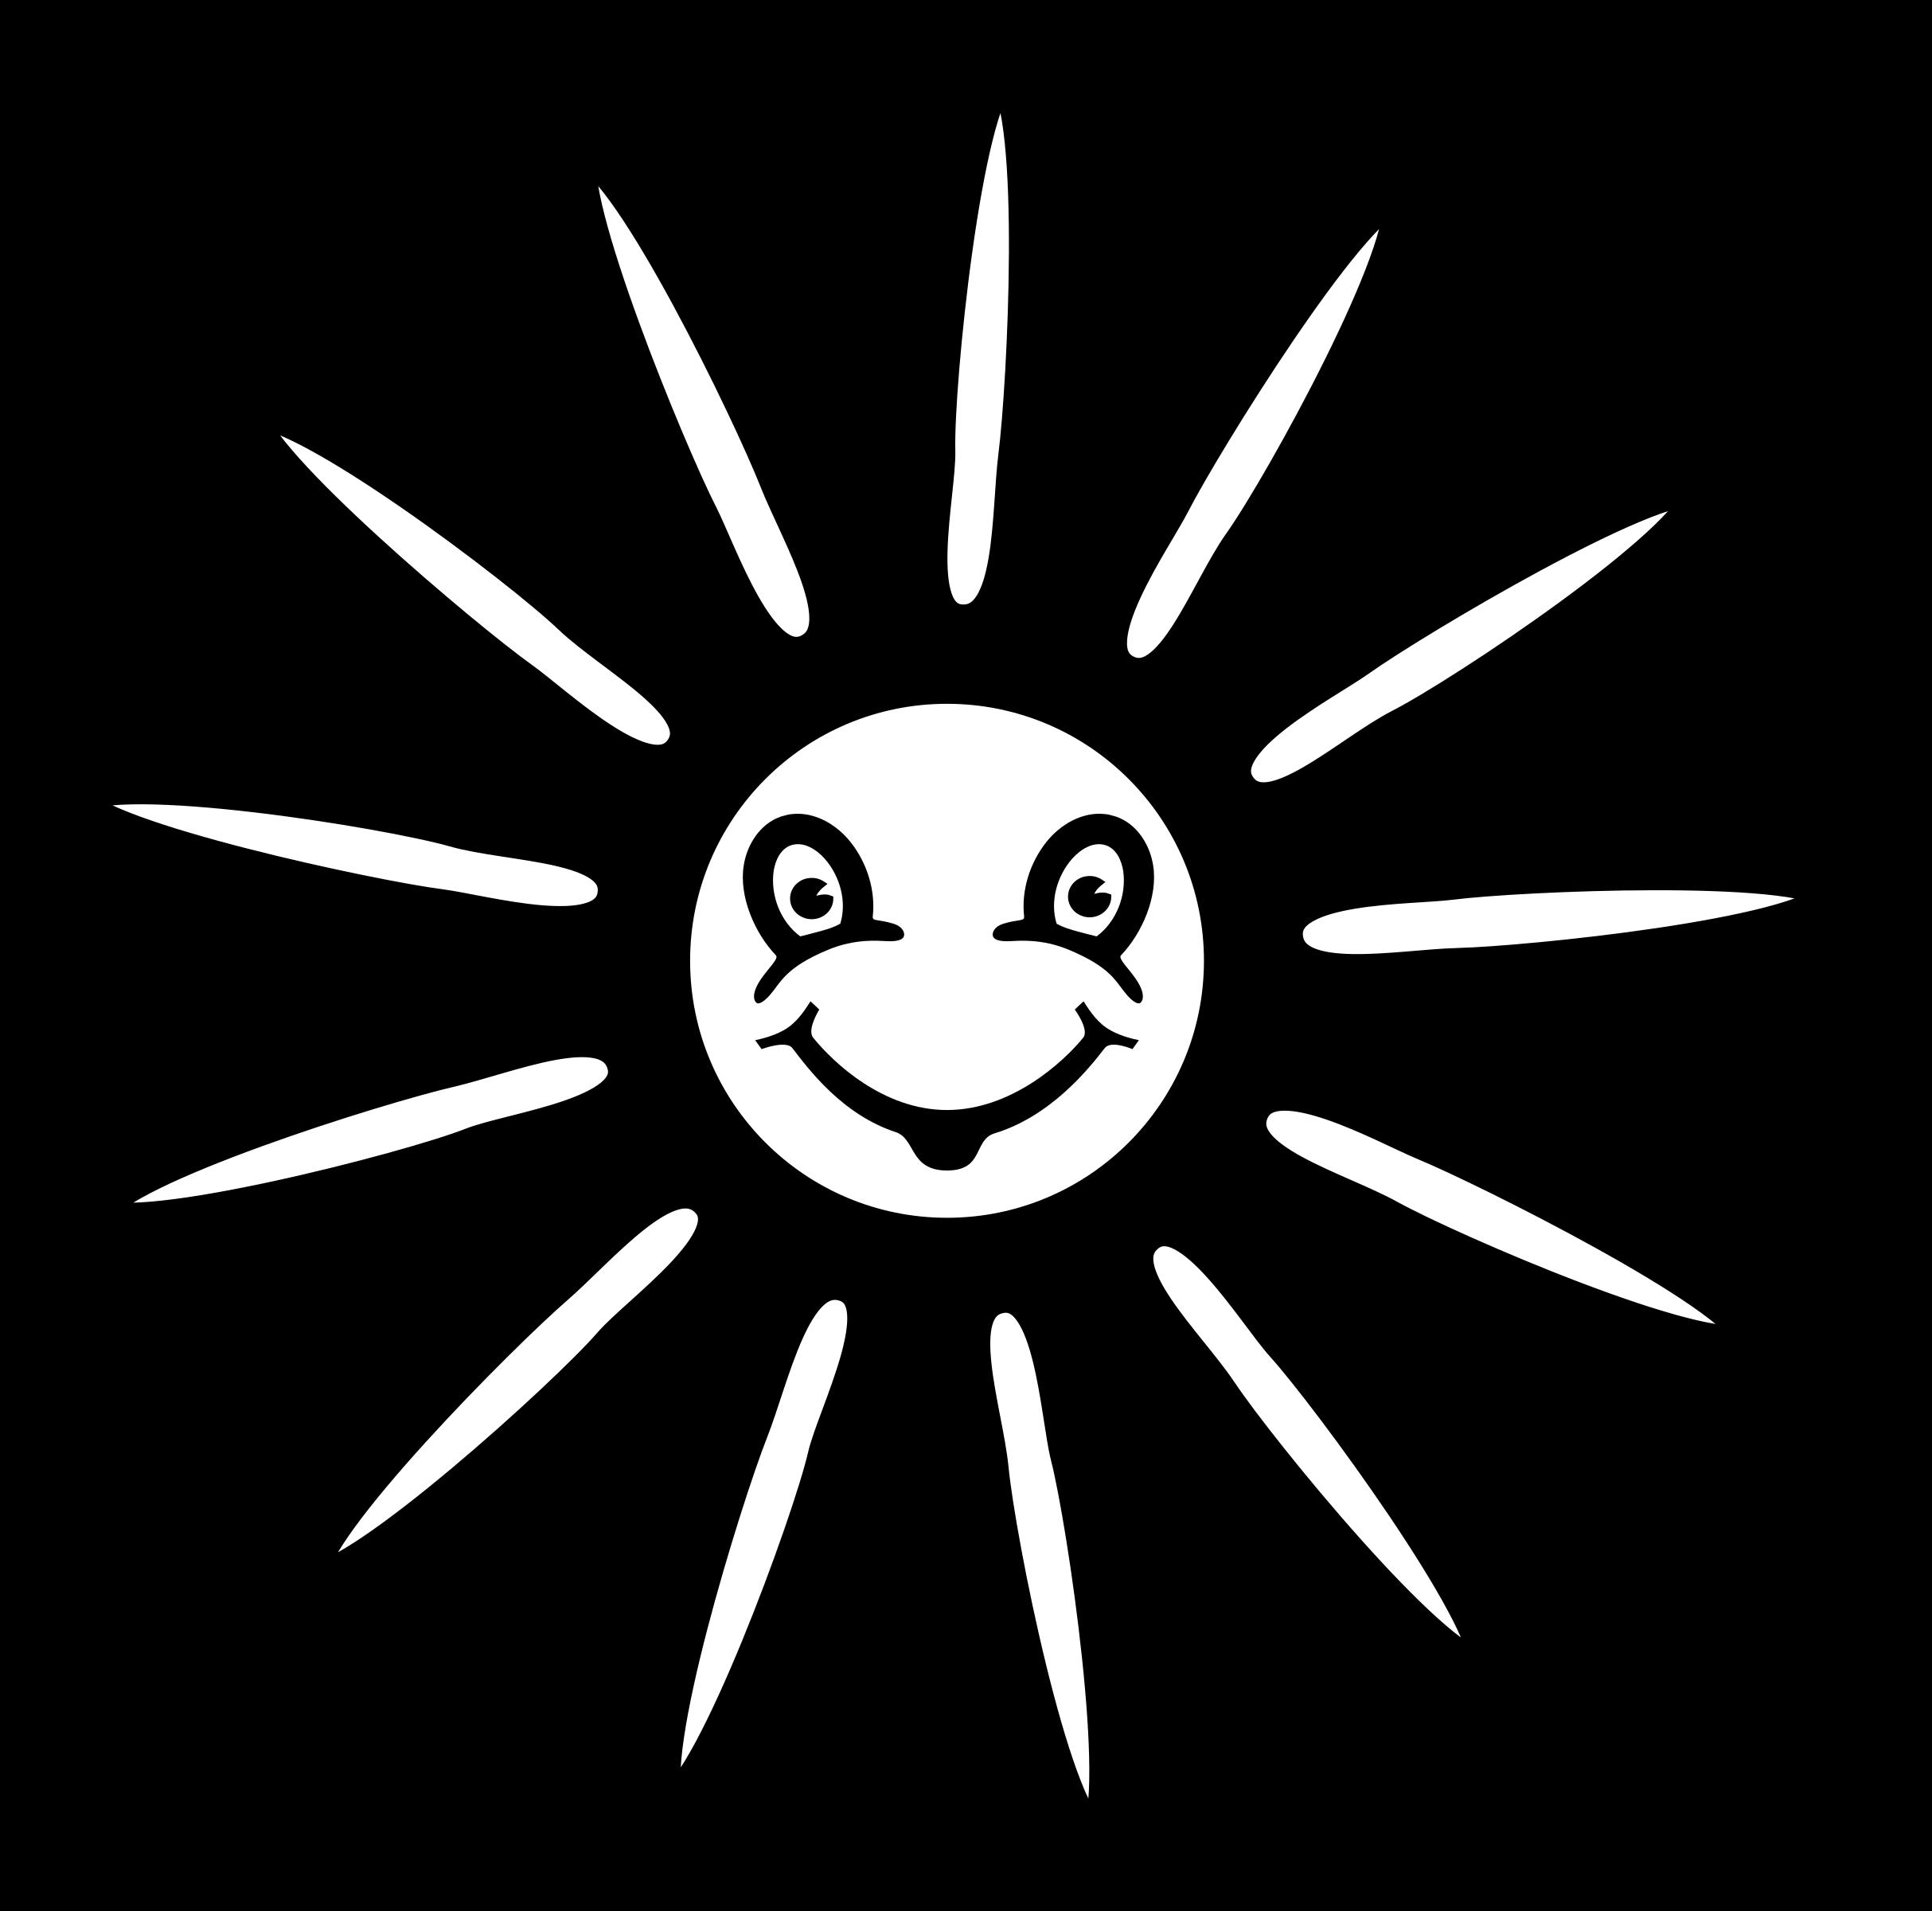 Coloring clipart sun clip freeuse Clipart - sun - lineart clip freeuse